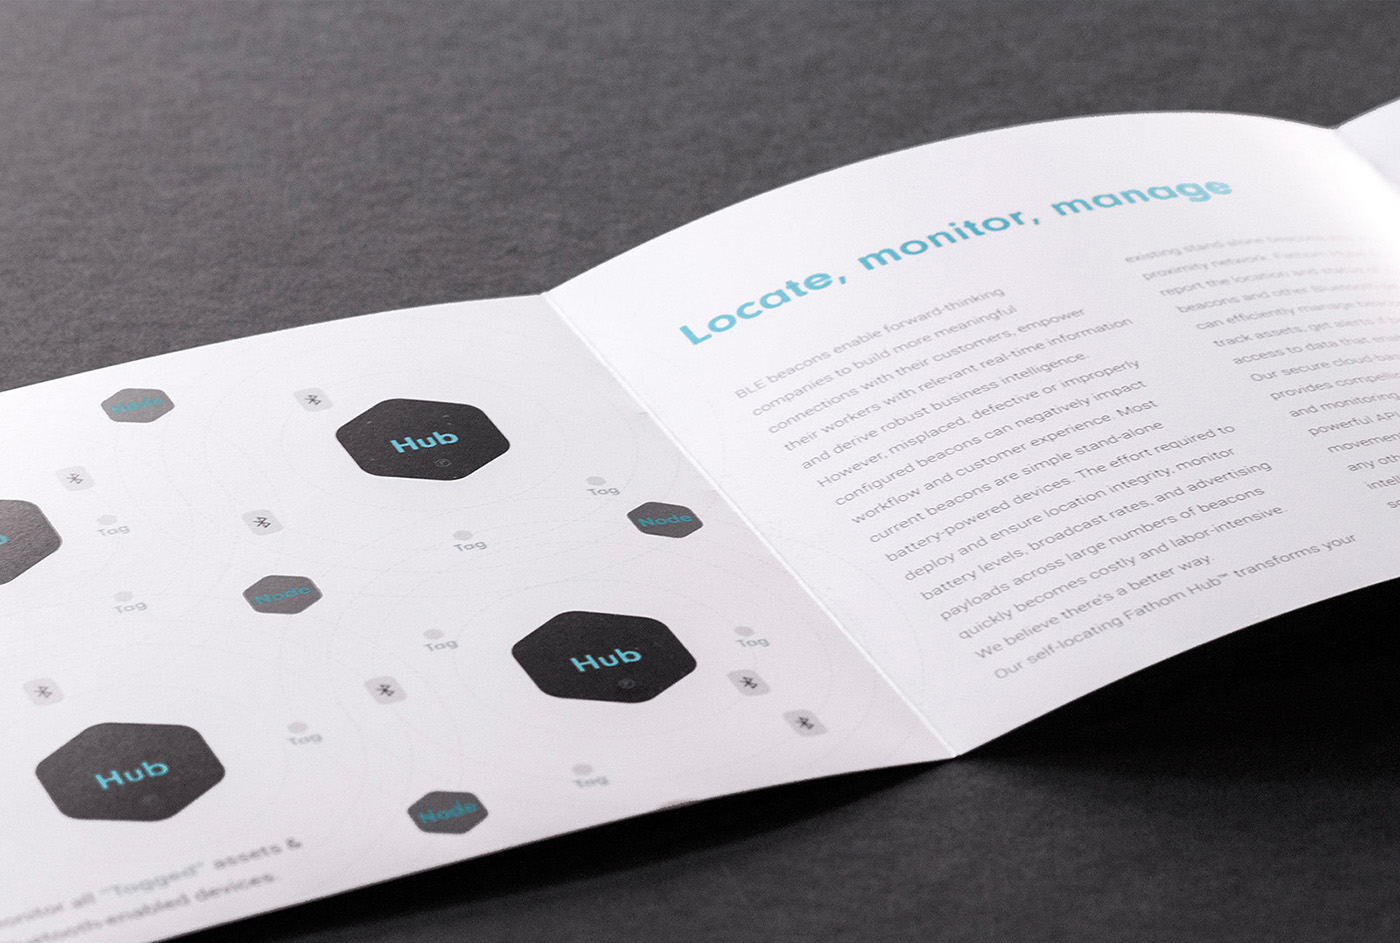 fathom beacon Packaging product UI ux identity IoT bluetooth